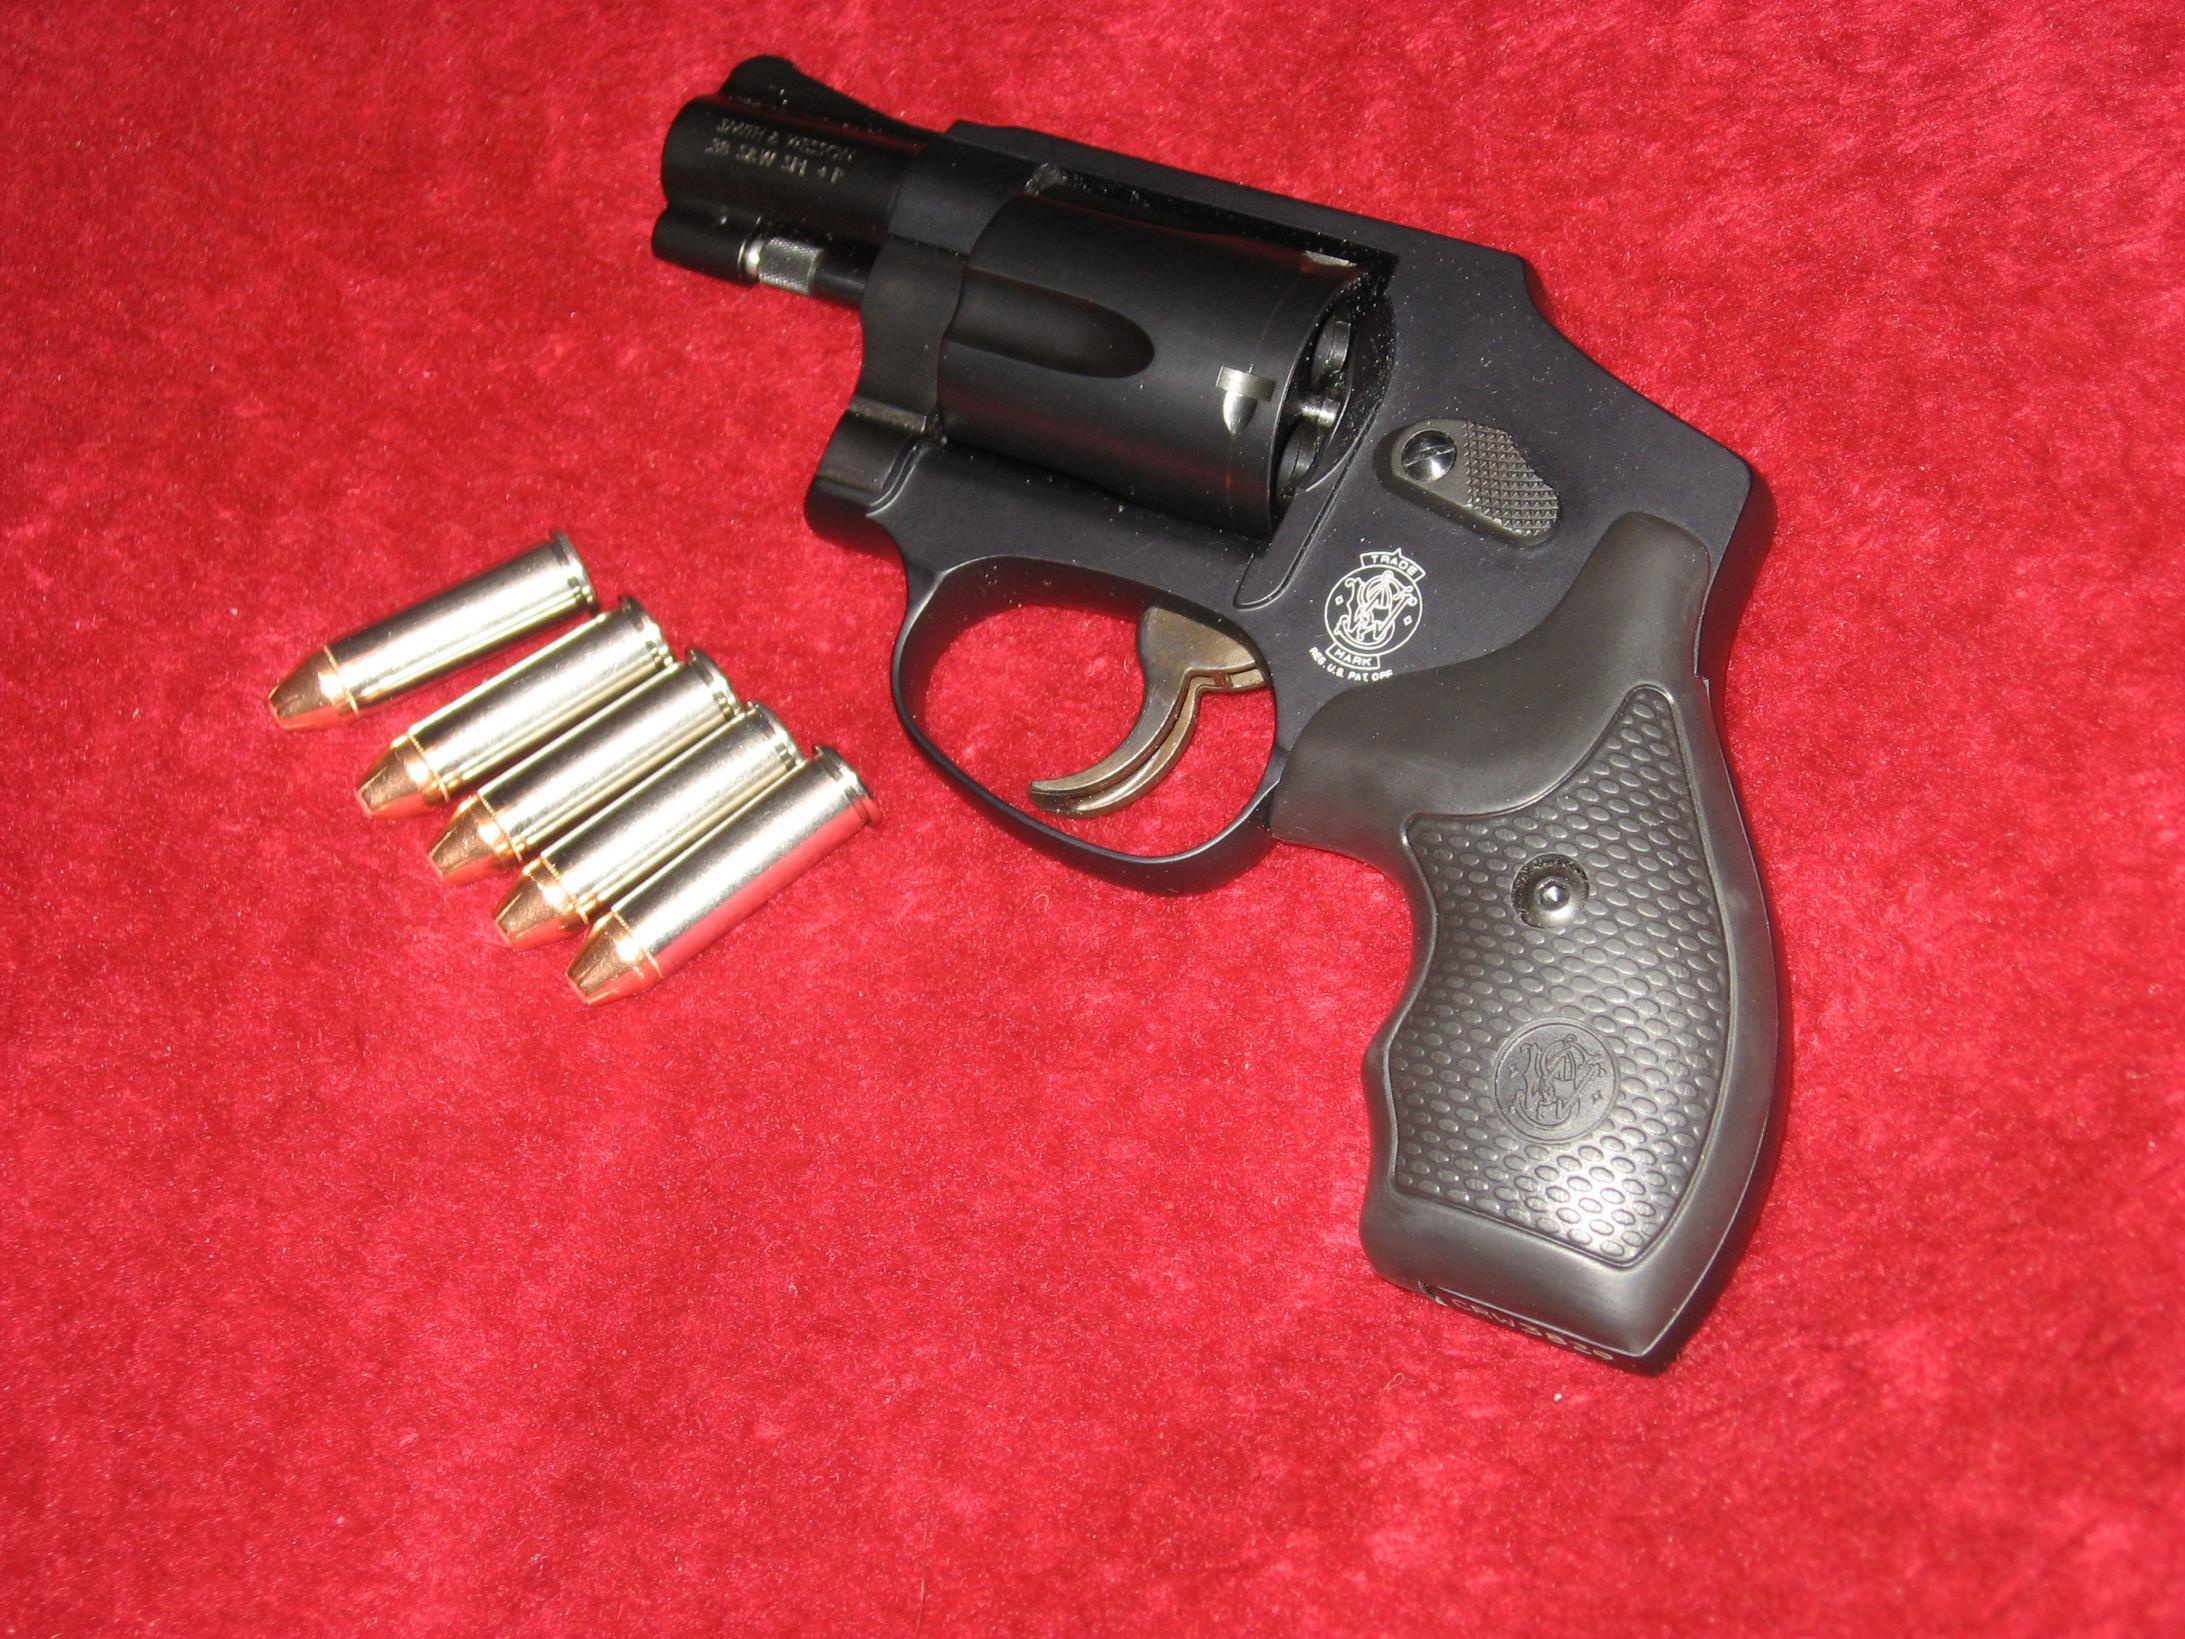 Revolver-smith-wesson-model-442-5-shot-38-spec..jpg